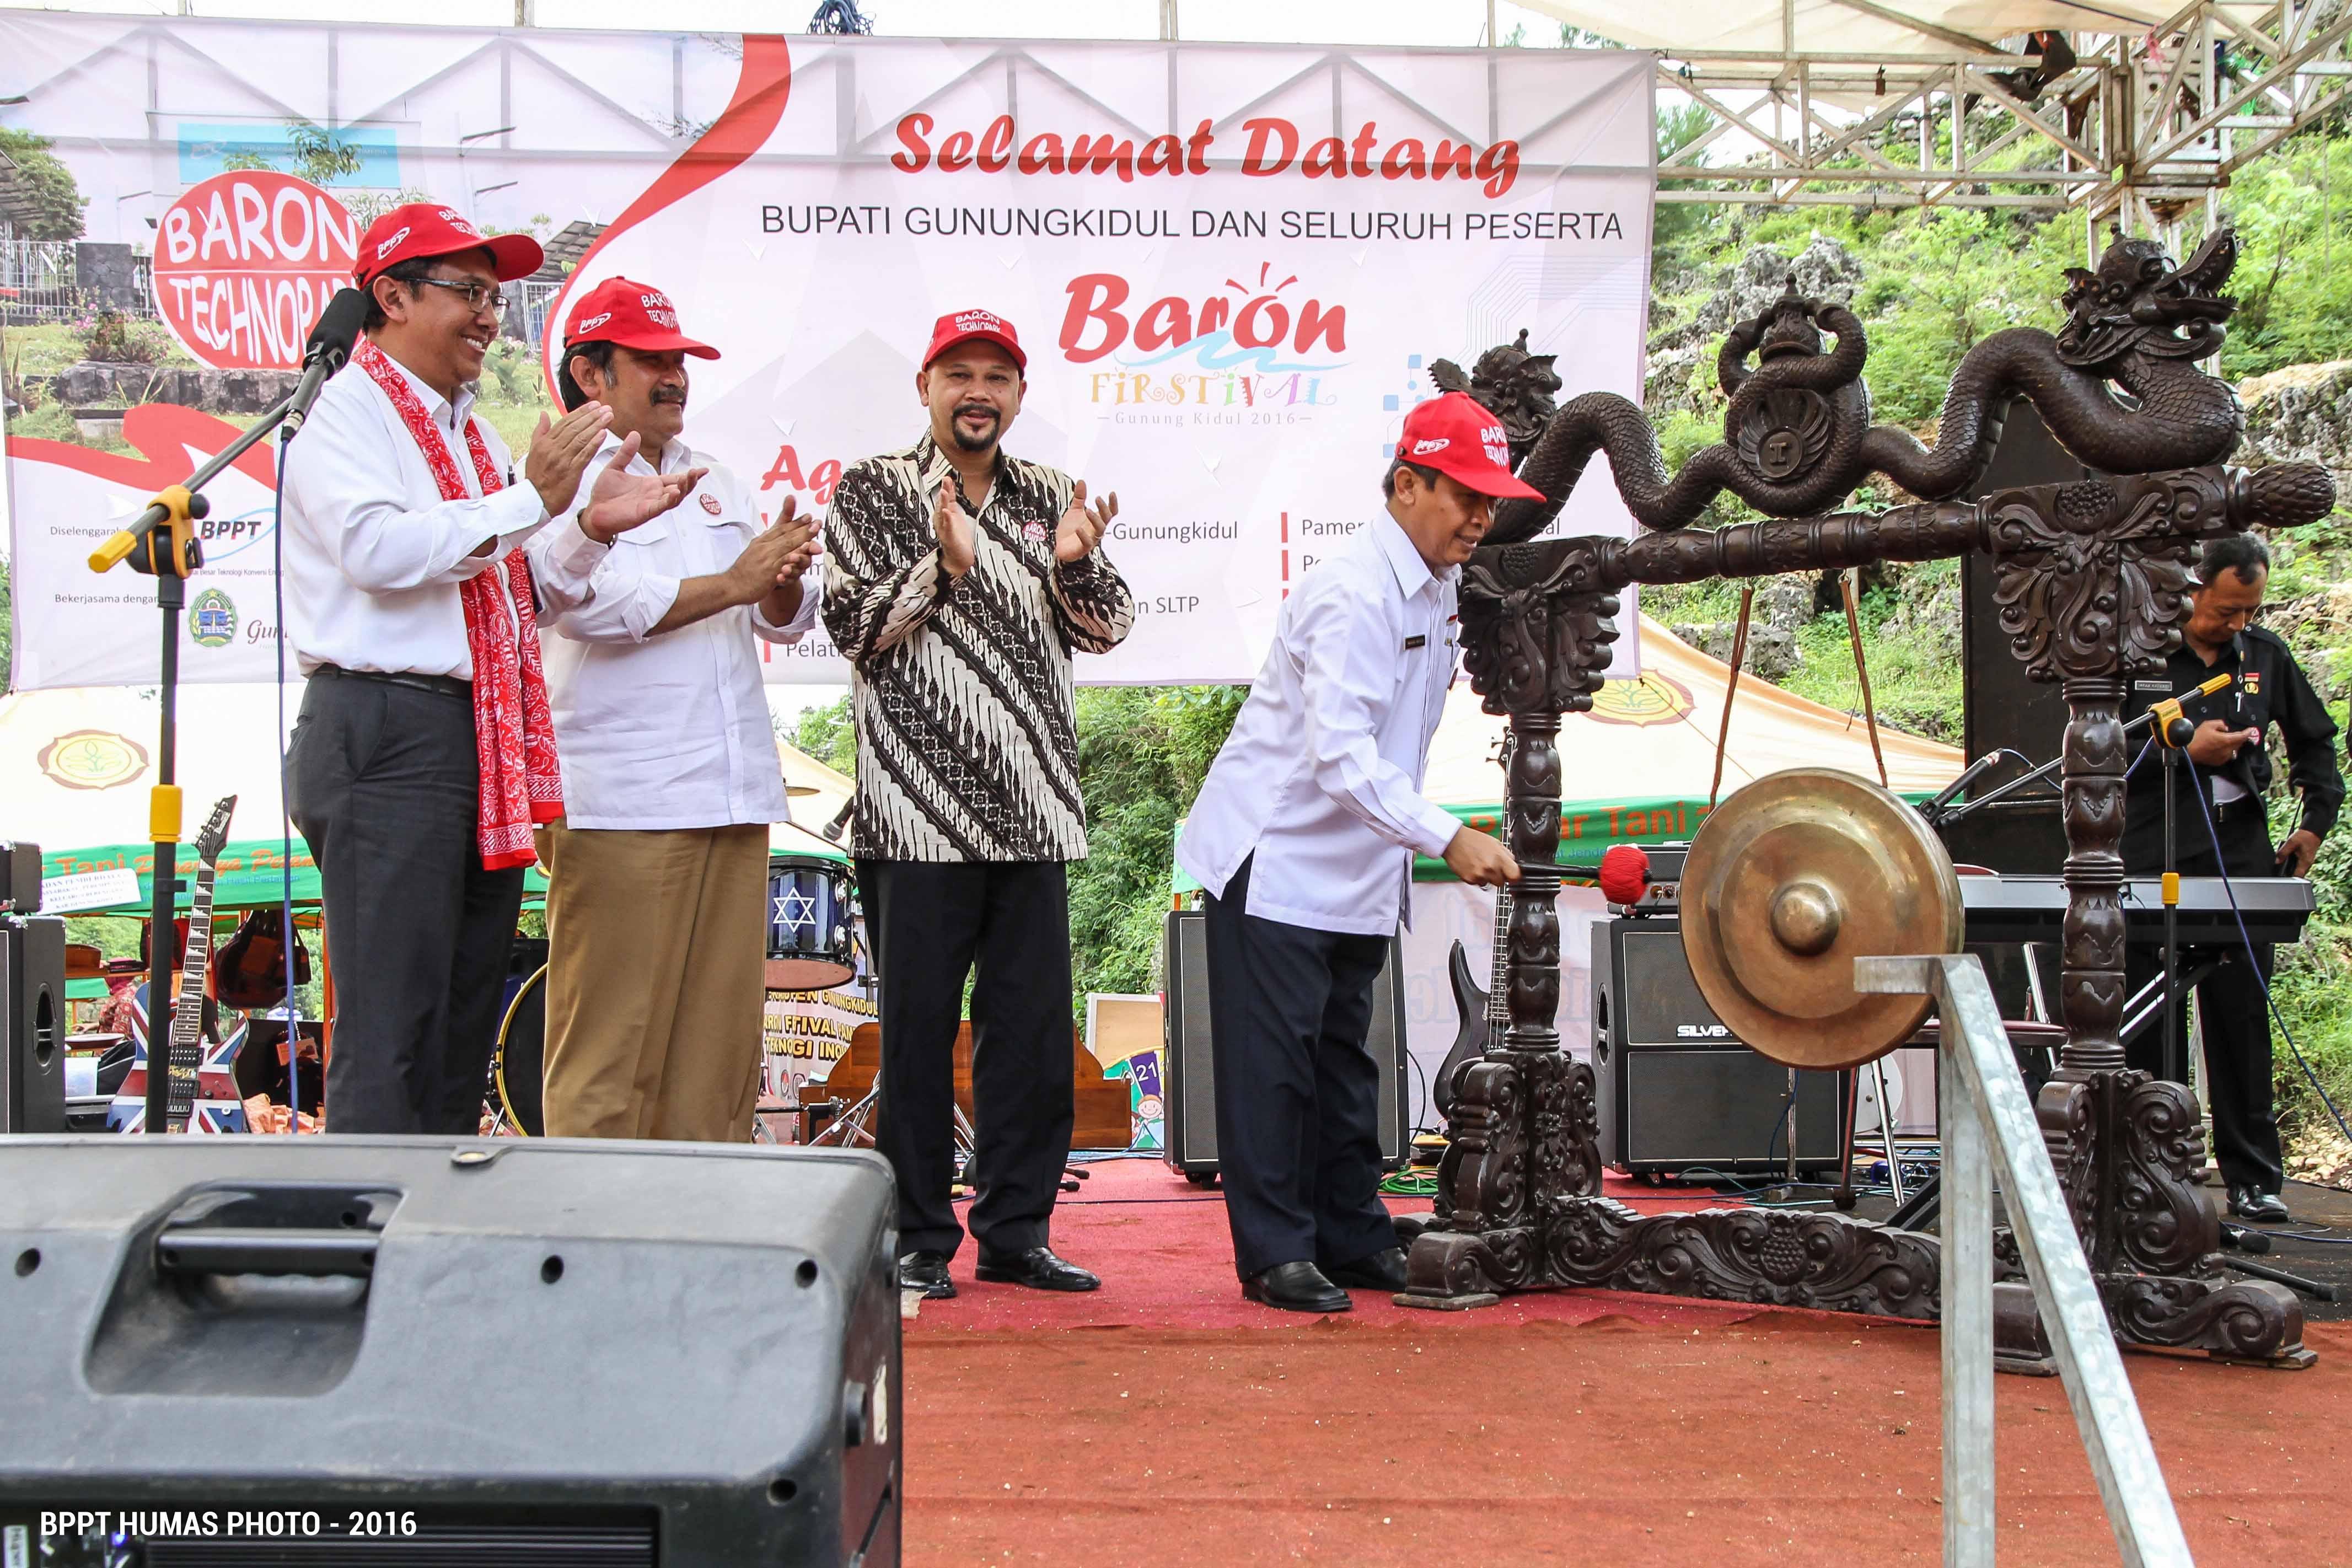 Baron Festival Inovasi Budaya Gunungkidul Negeri Pantai Salah Satu Obyek